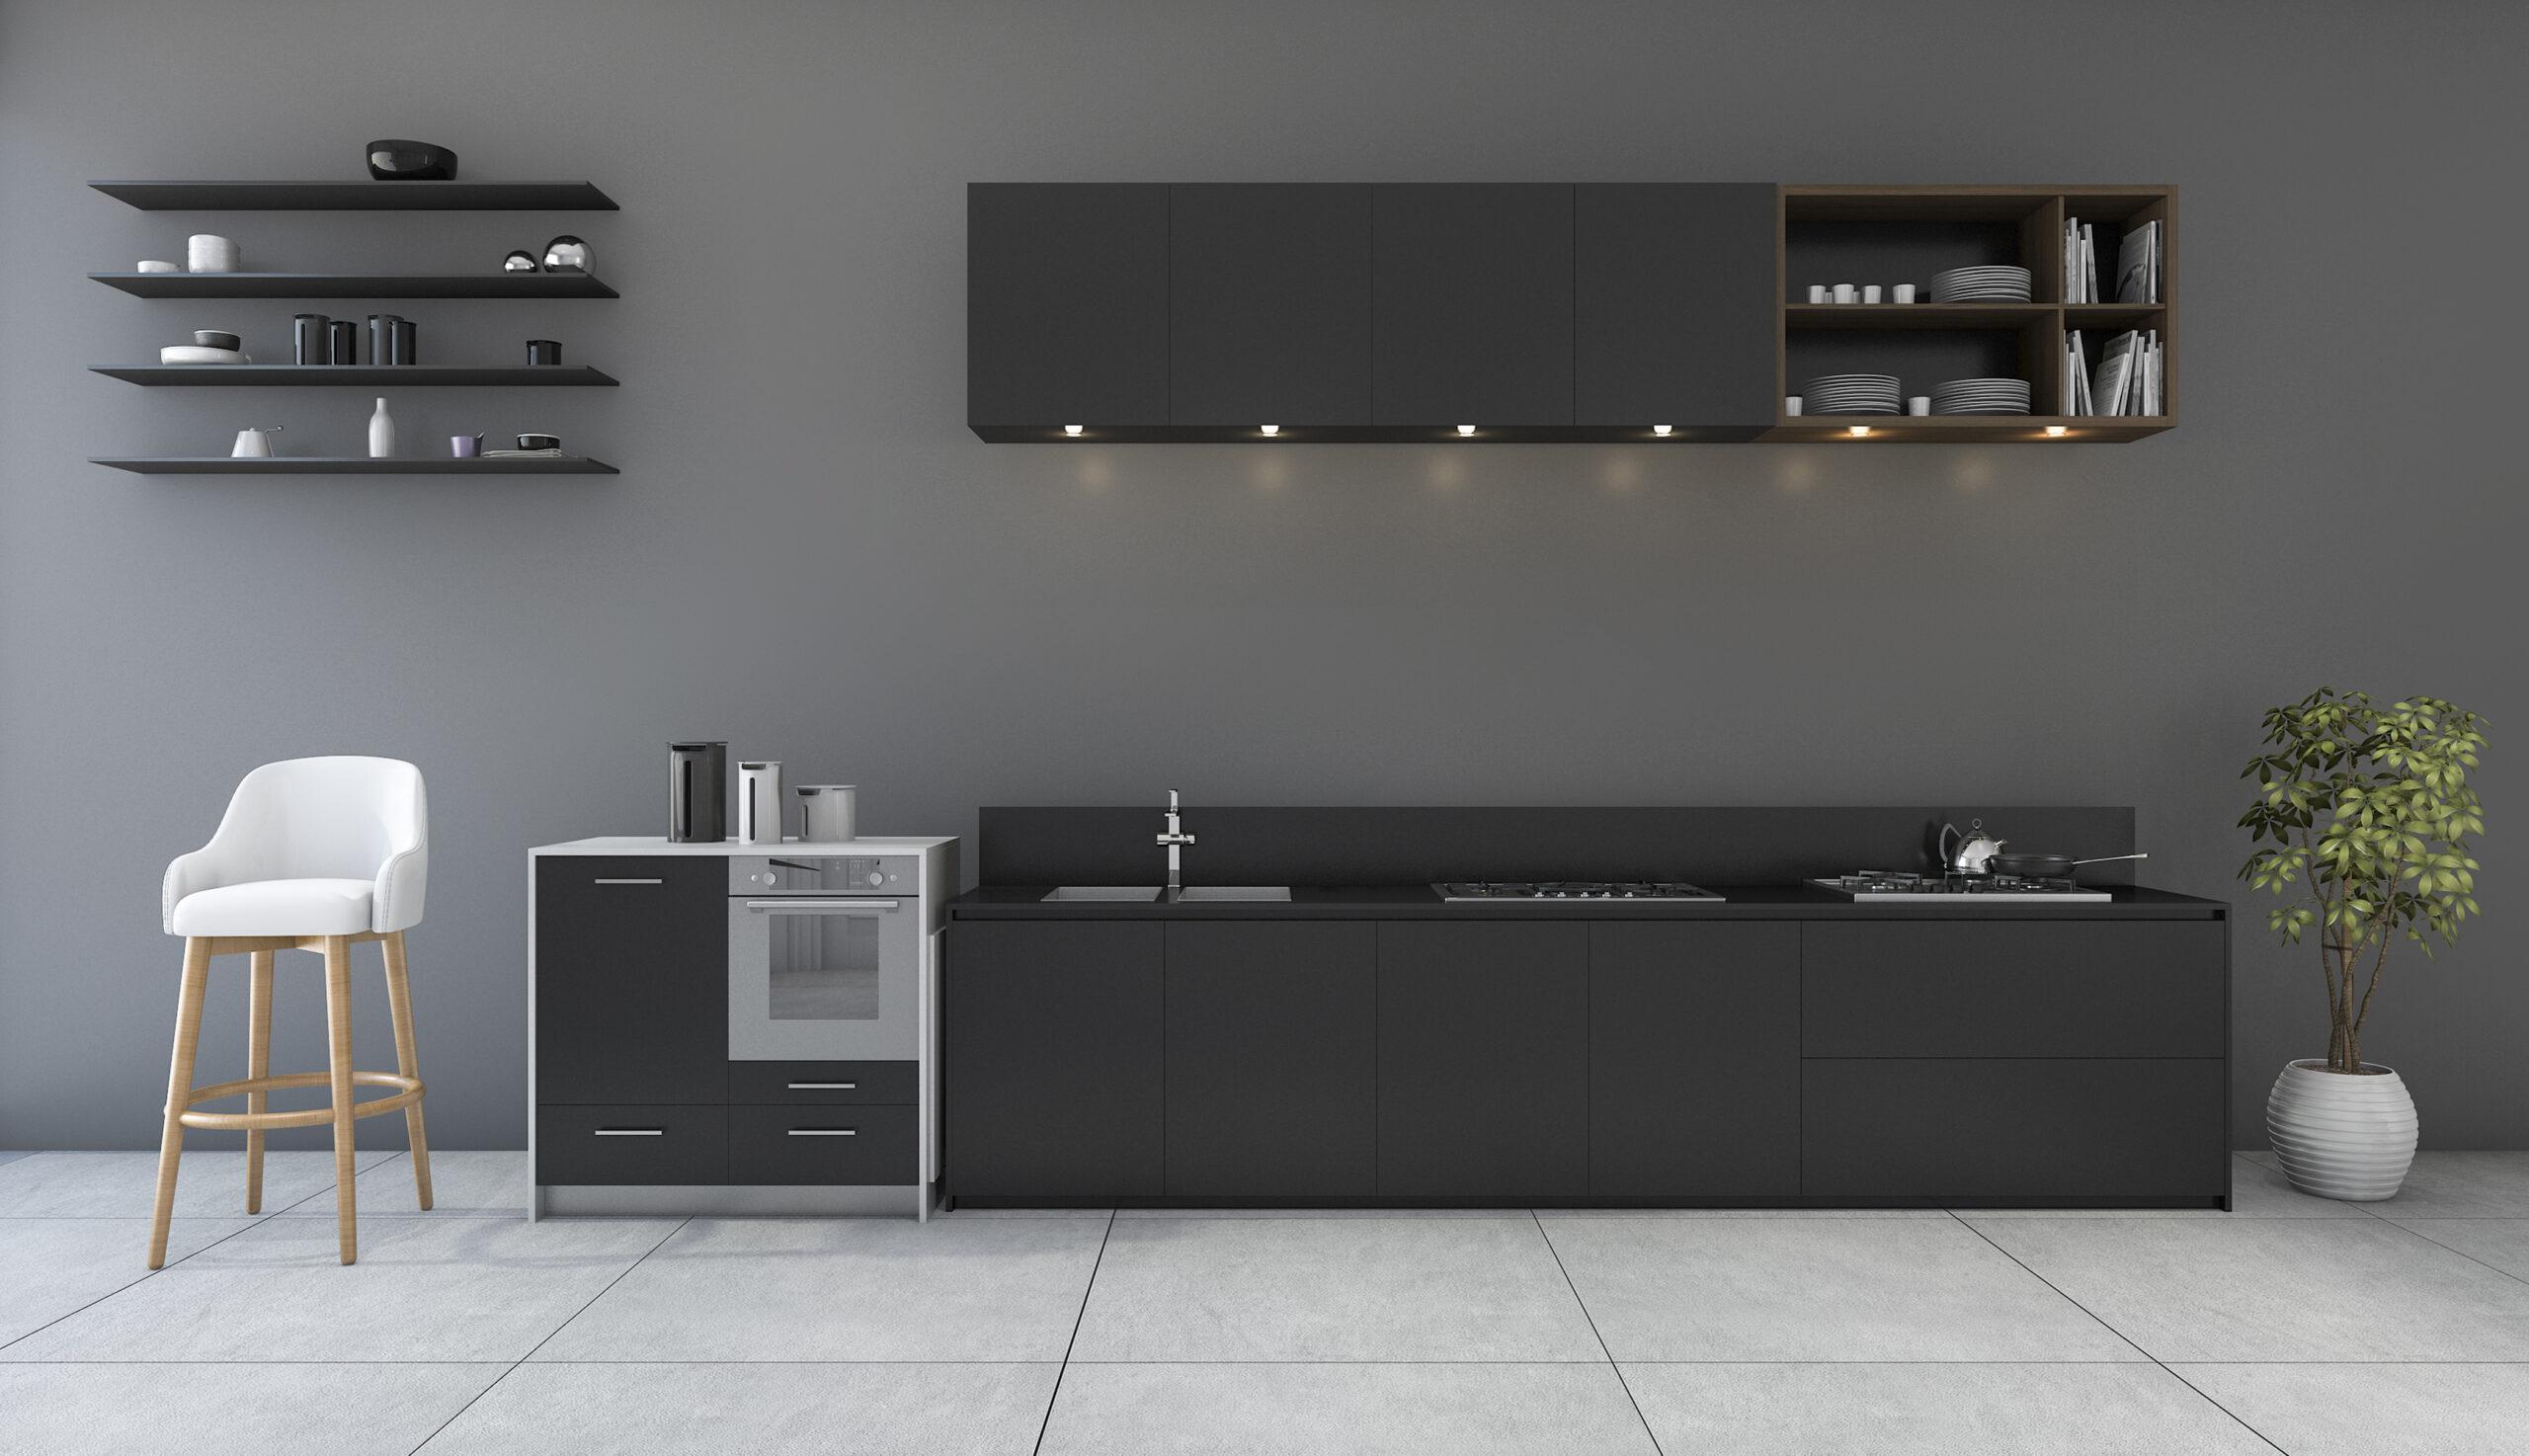 3d-rendering-black-kitchen-with-minimal-design-room